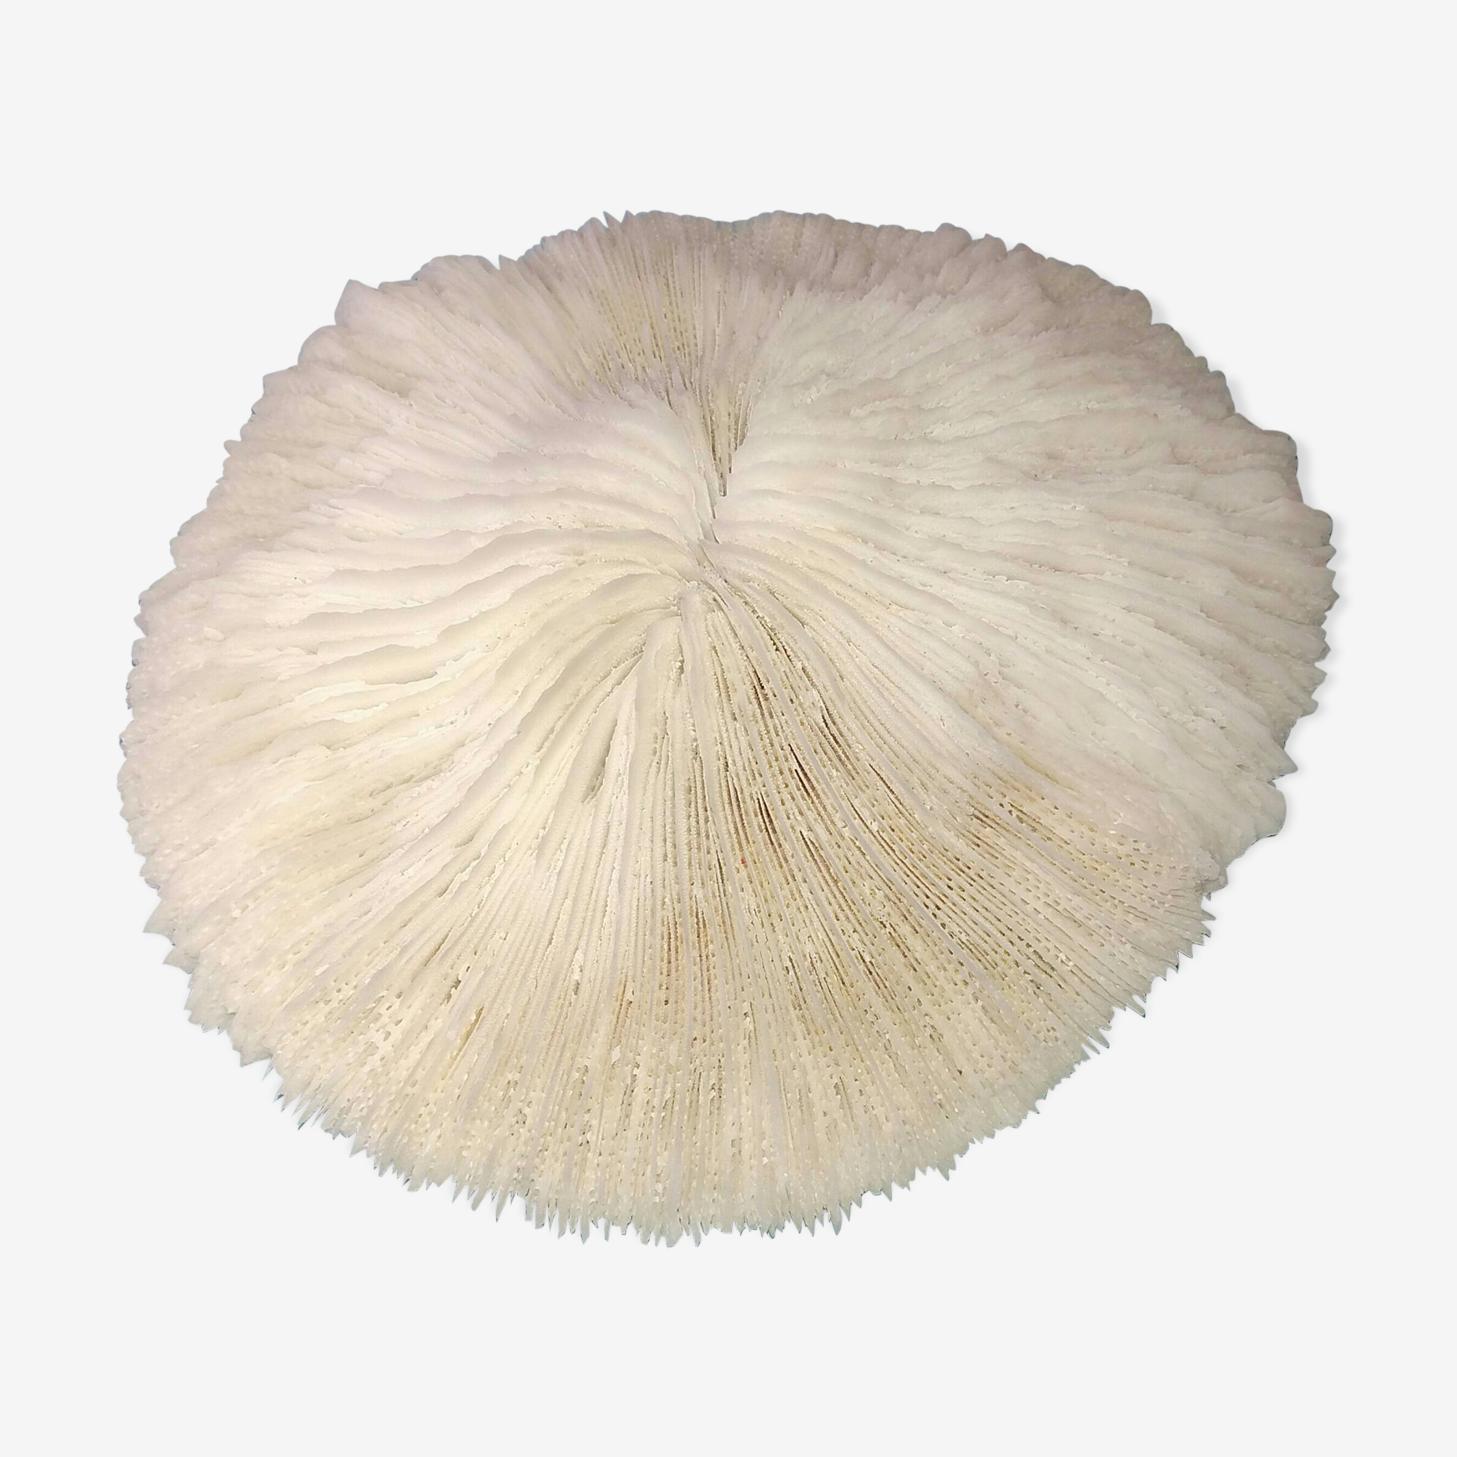 Corail champignon blanc ancien